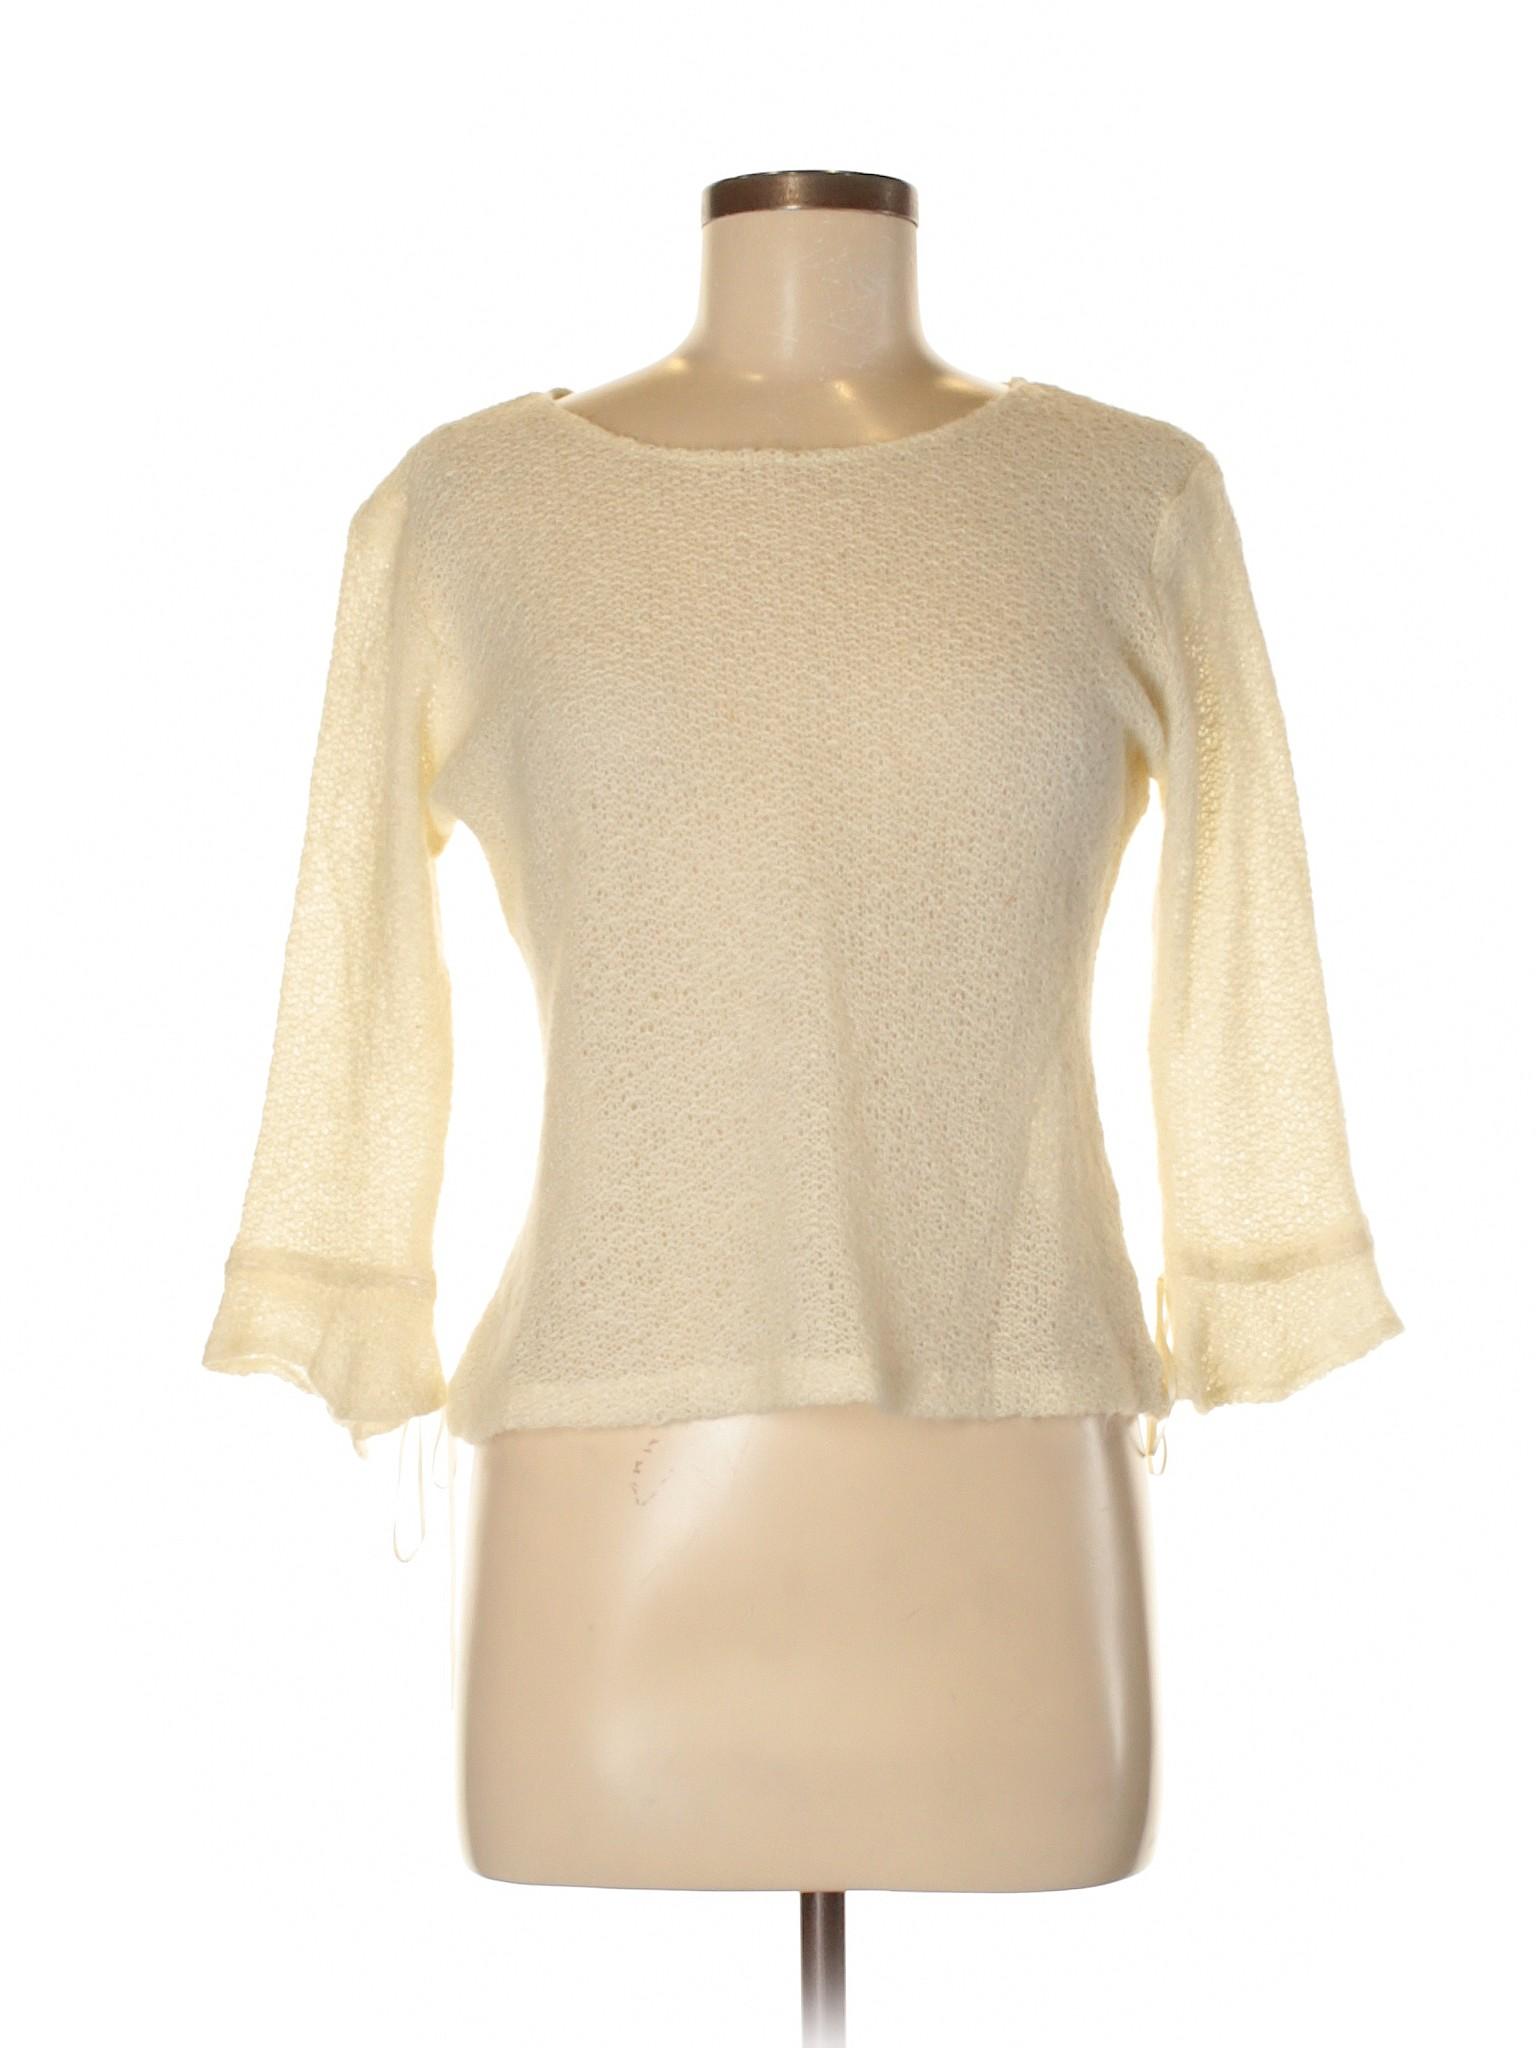 Pullover Sweater amp; J P Mattie Boutique wqPTZvv